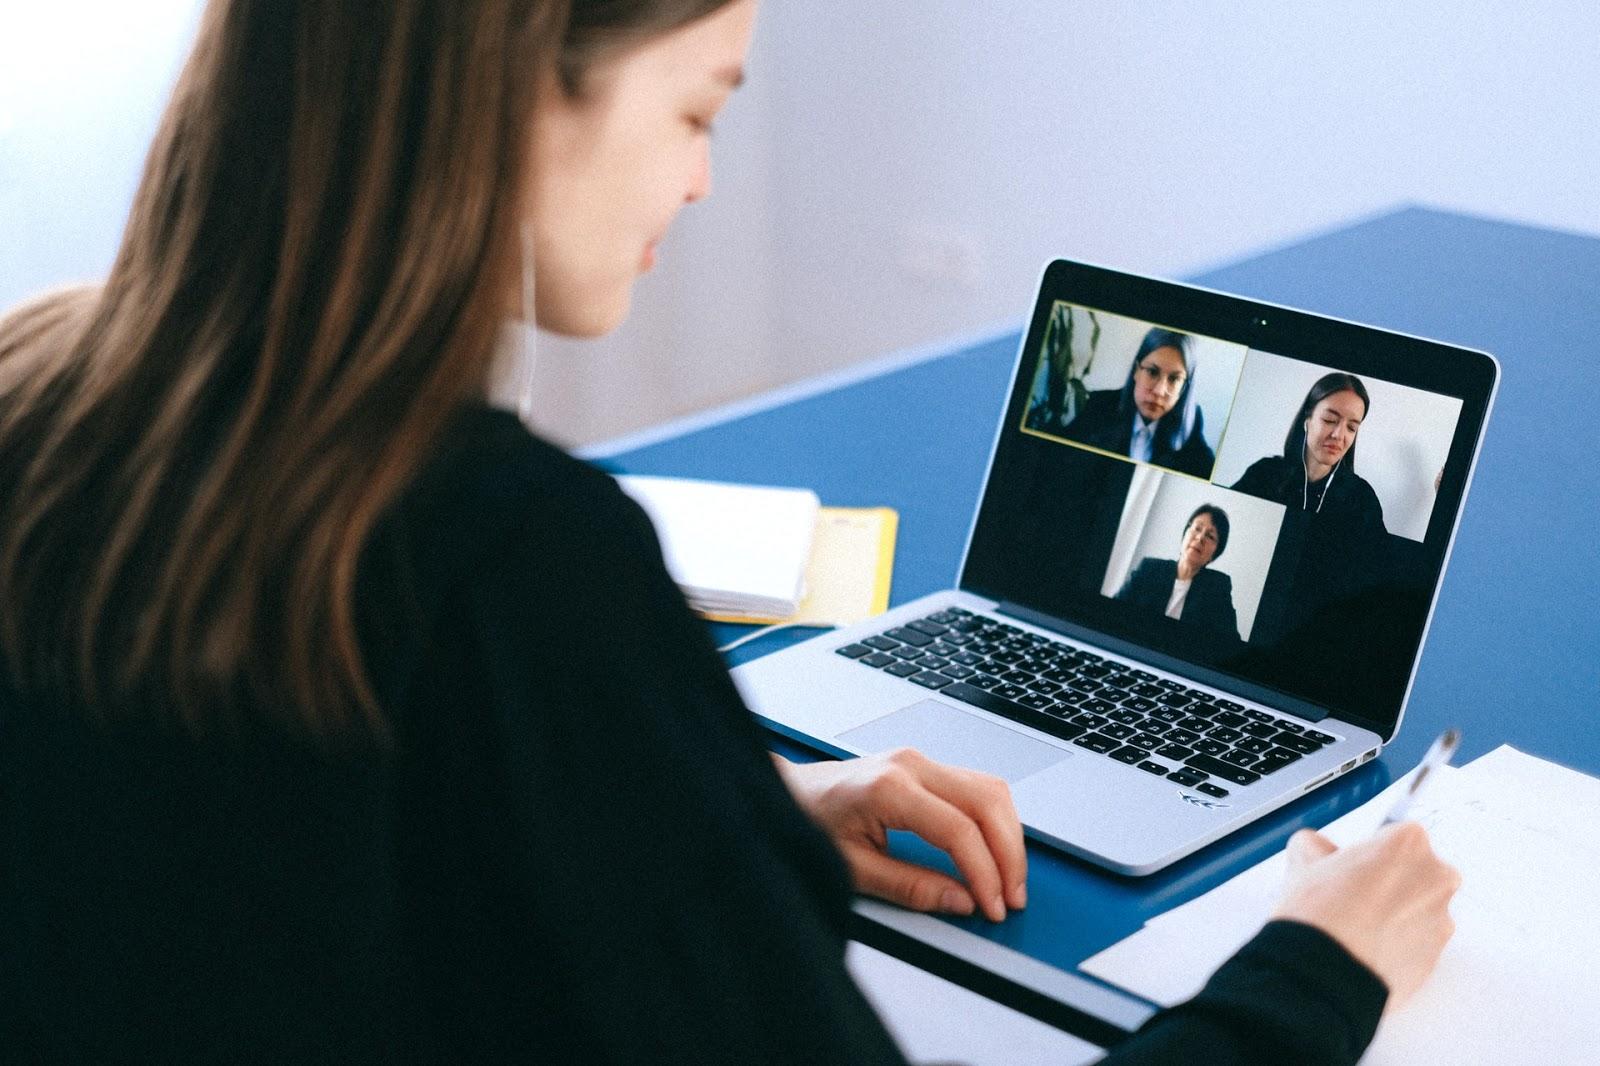 4 Reasons Why Virtual Career Fairs Are Better Than Regular Career Fairs